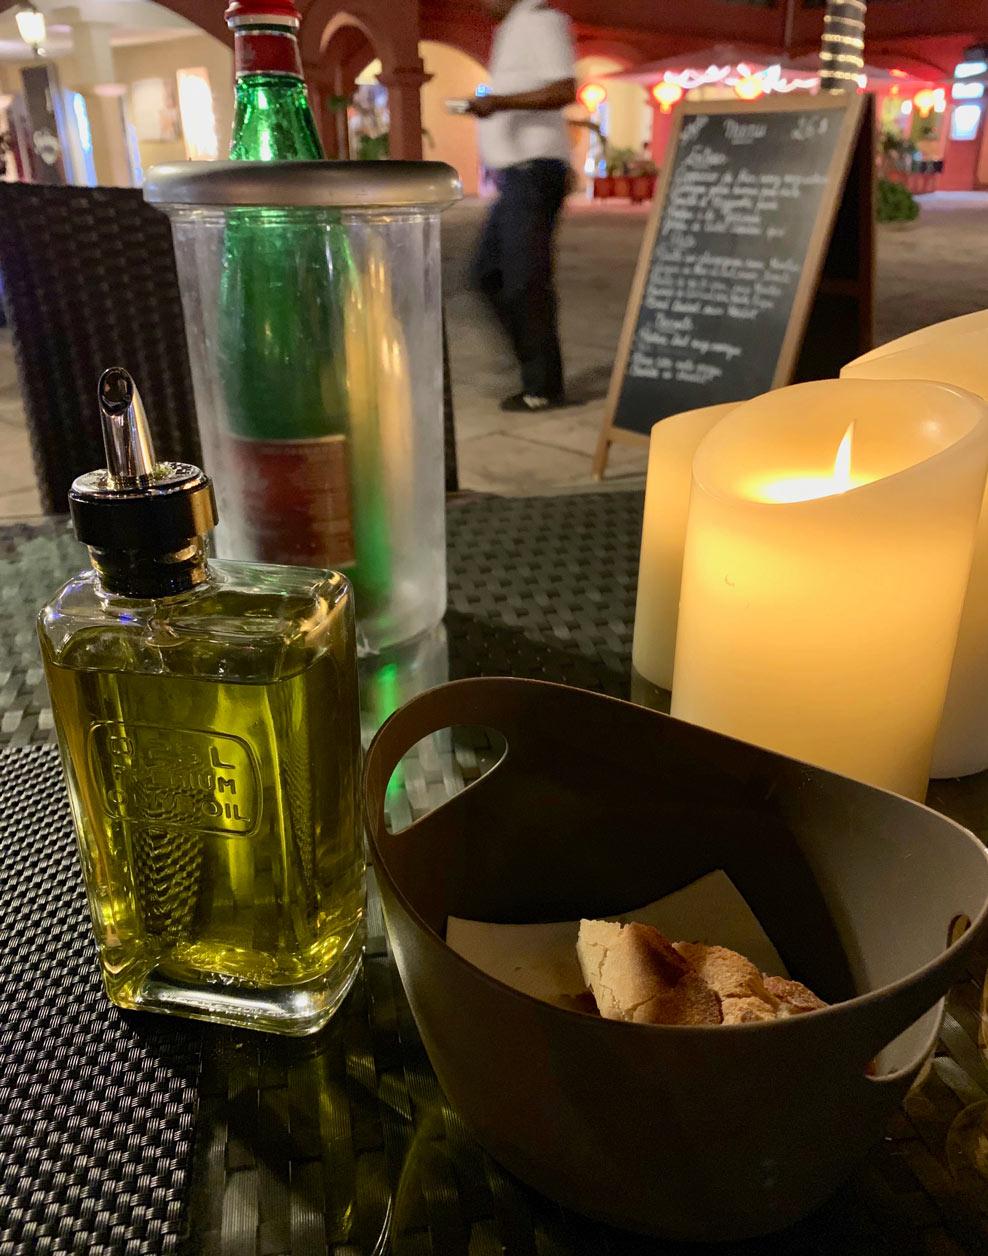 Saint-Martin-Restaurant-Altro-Olive-Oil-Bread.jpg